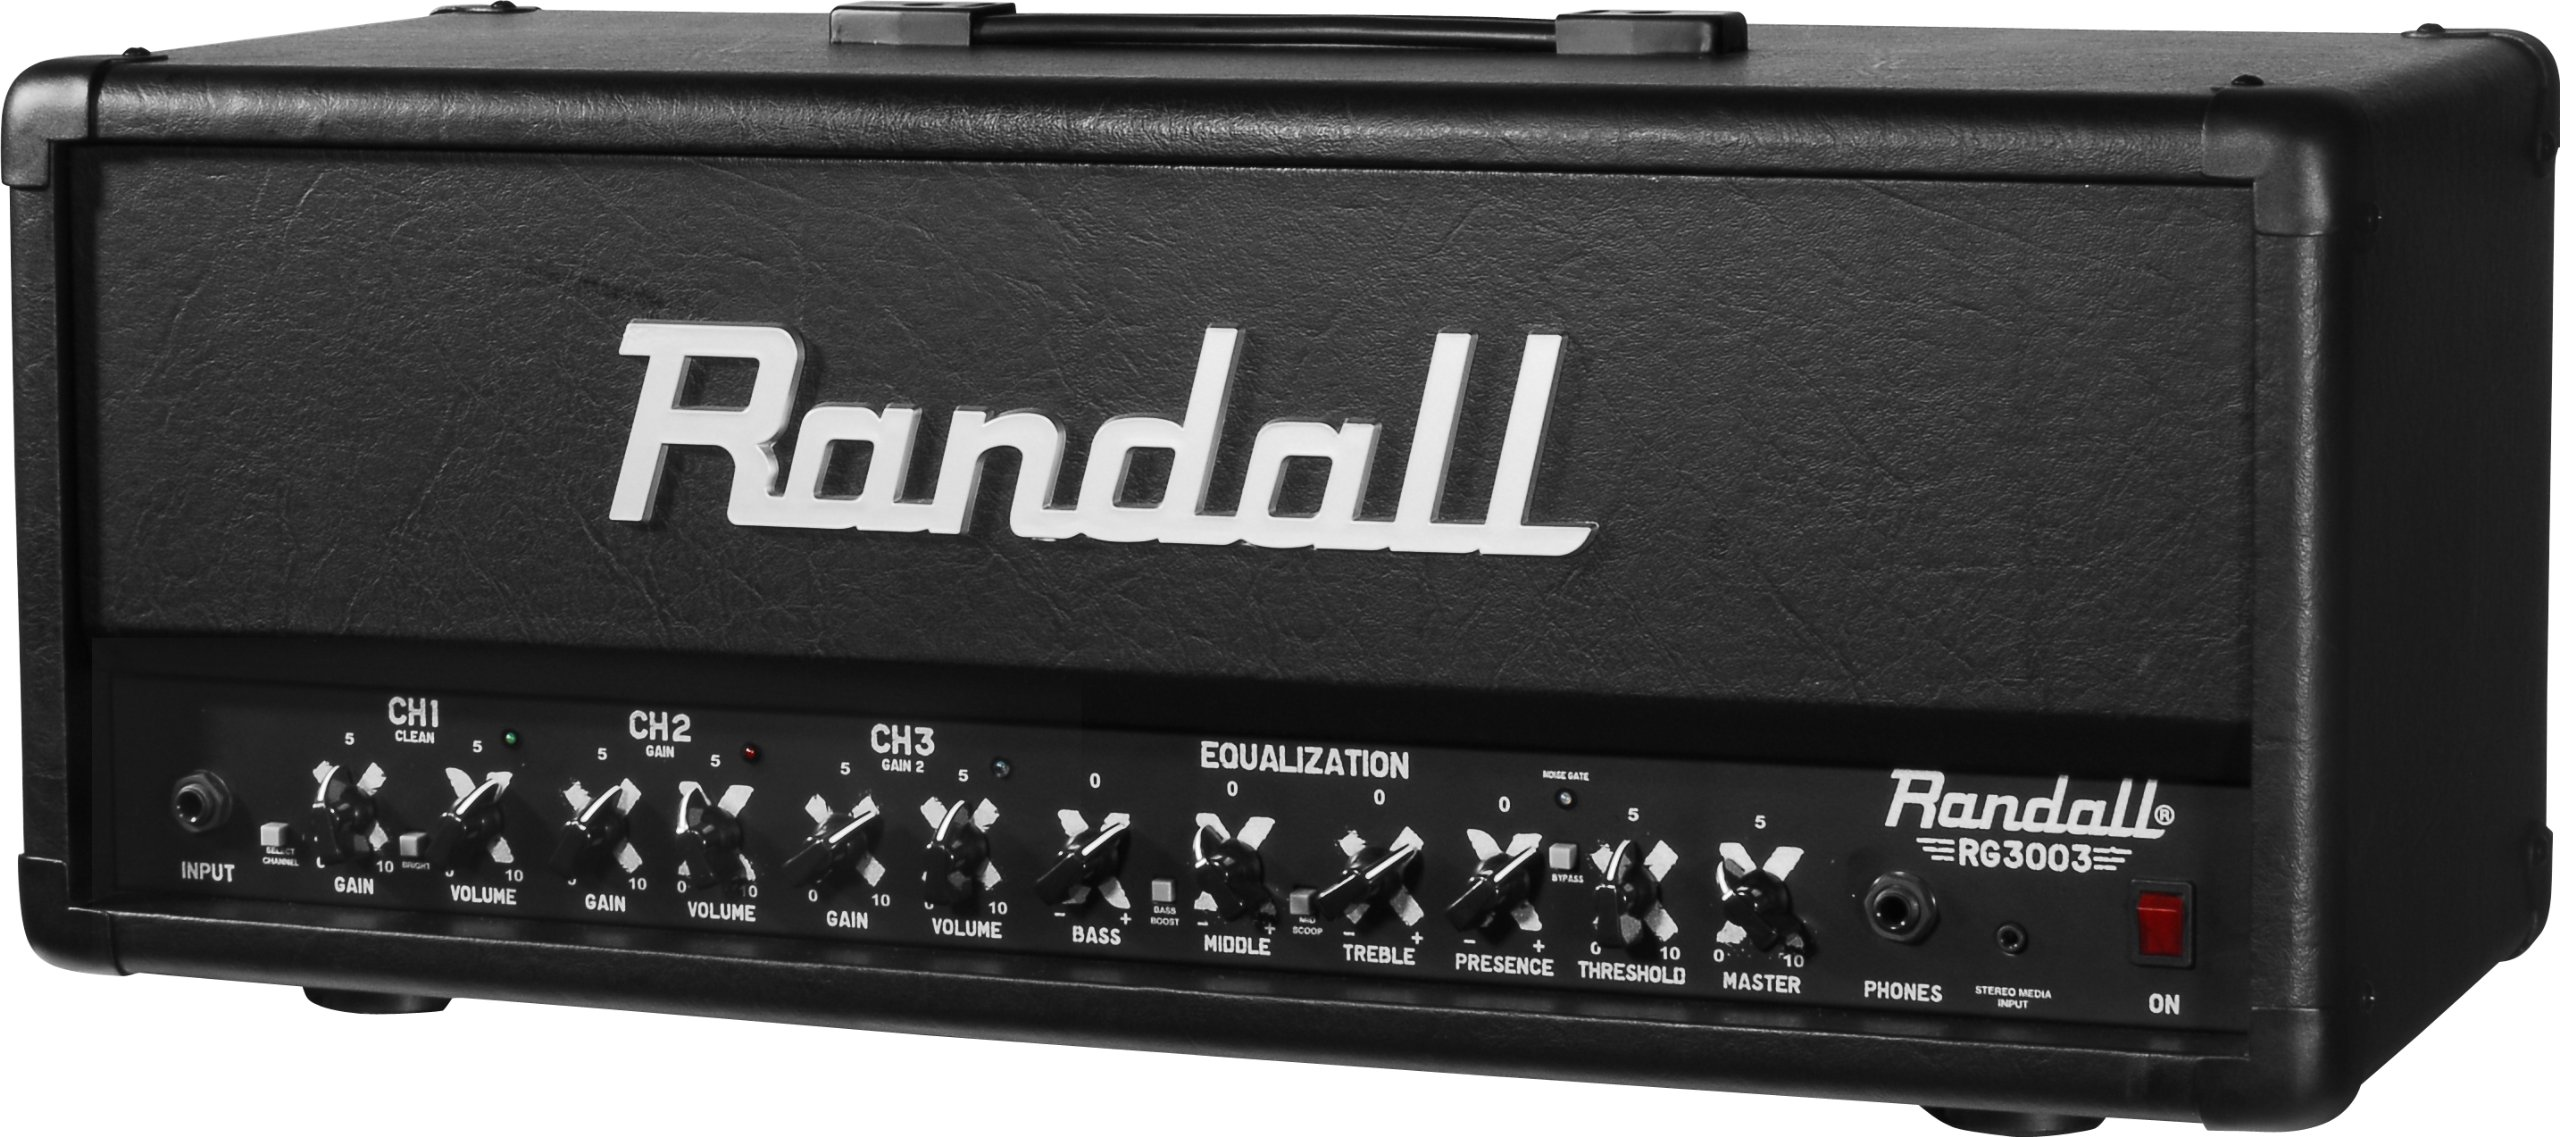 Randall RG3003H RG Series Amplifier Head by Randall